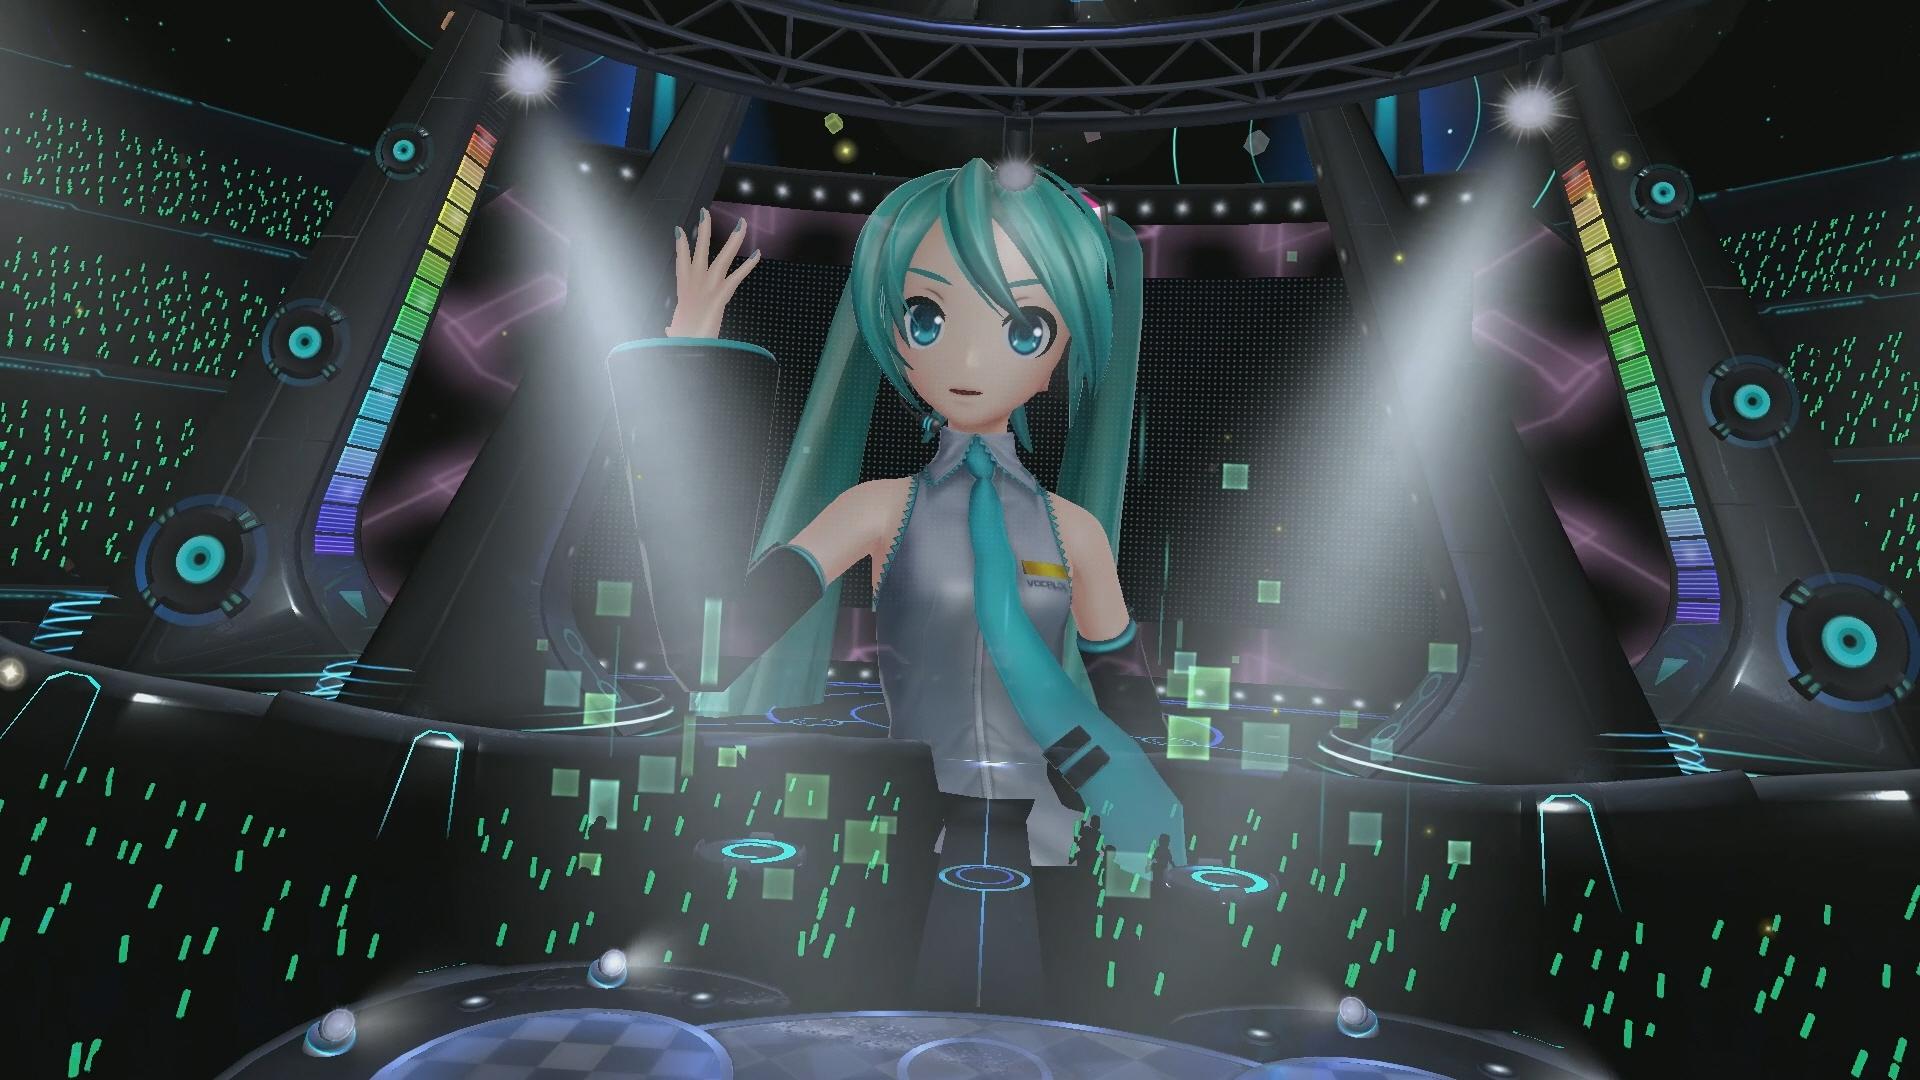 How Sega brought virtual pop star Hatsune Miku to